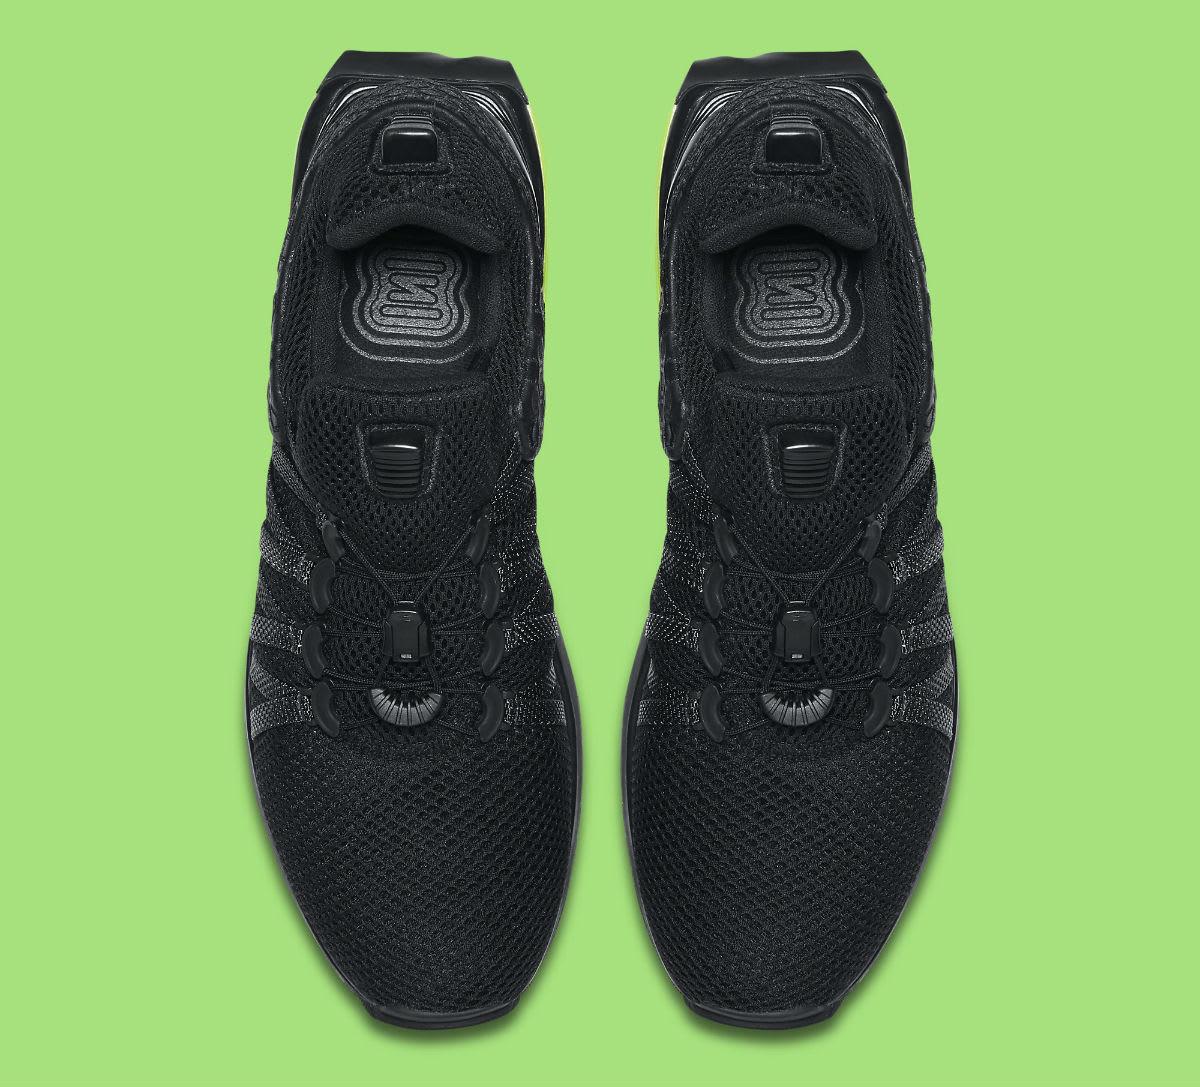 Nike Shox Gravity Luxe Black Green Strike Release Date AR1470-003 Top